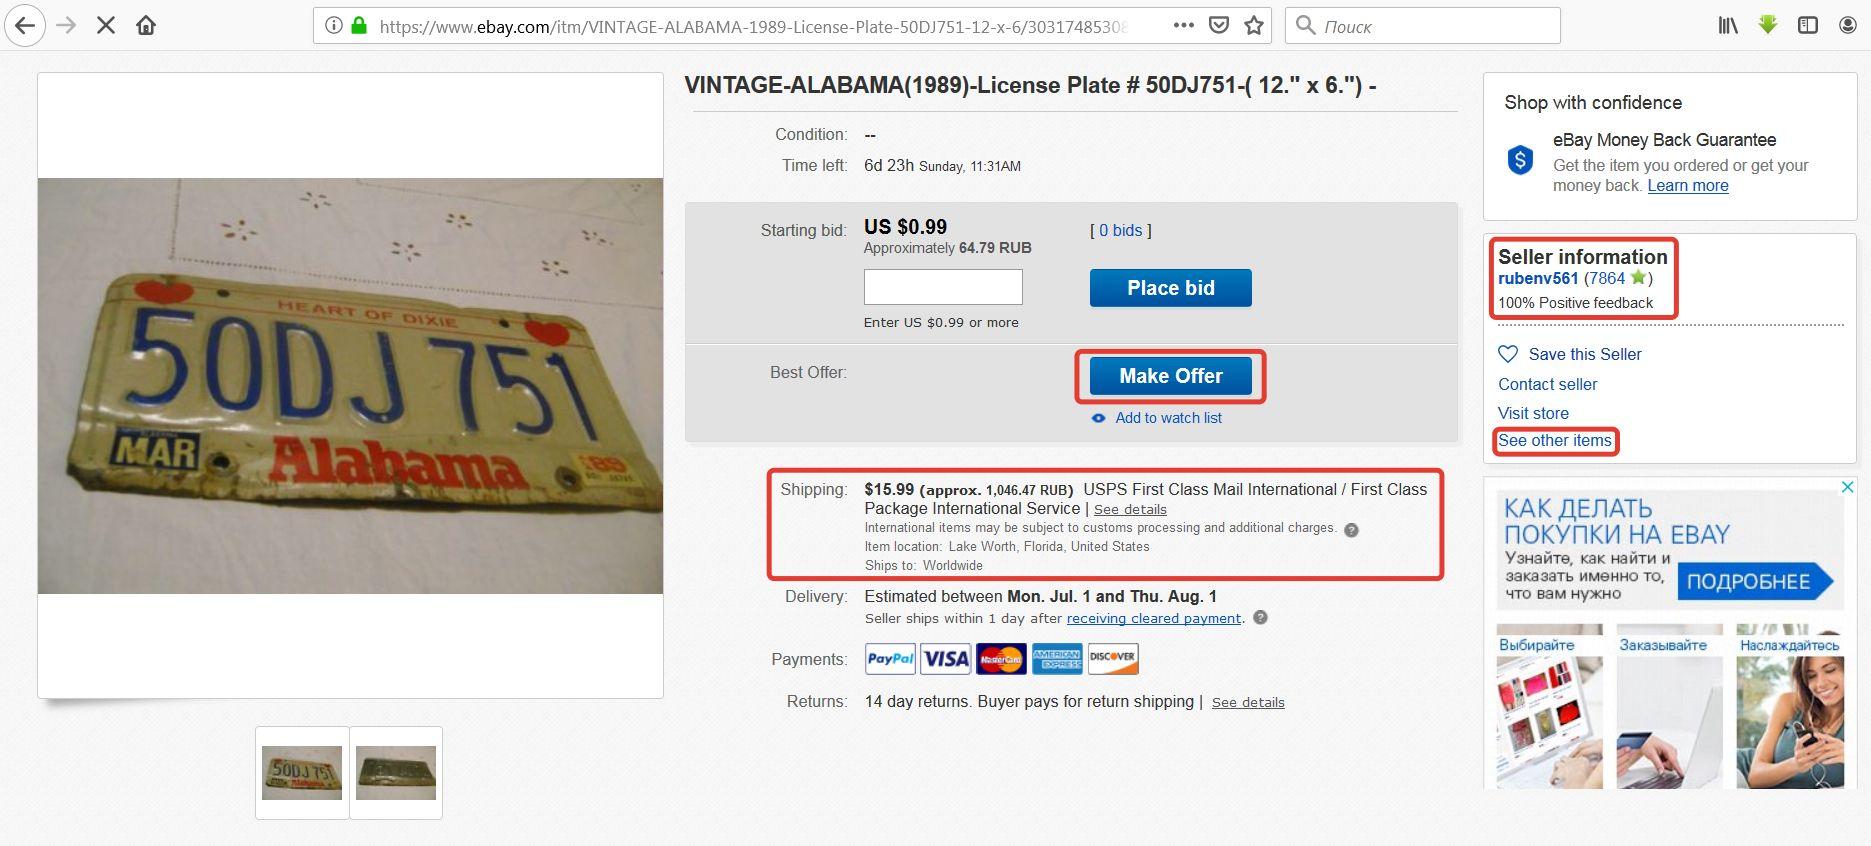 Интерфейс карточки товара eBay